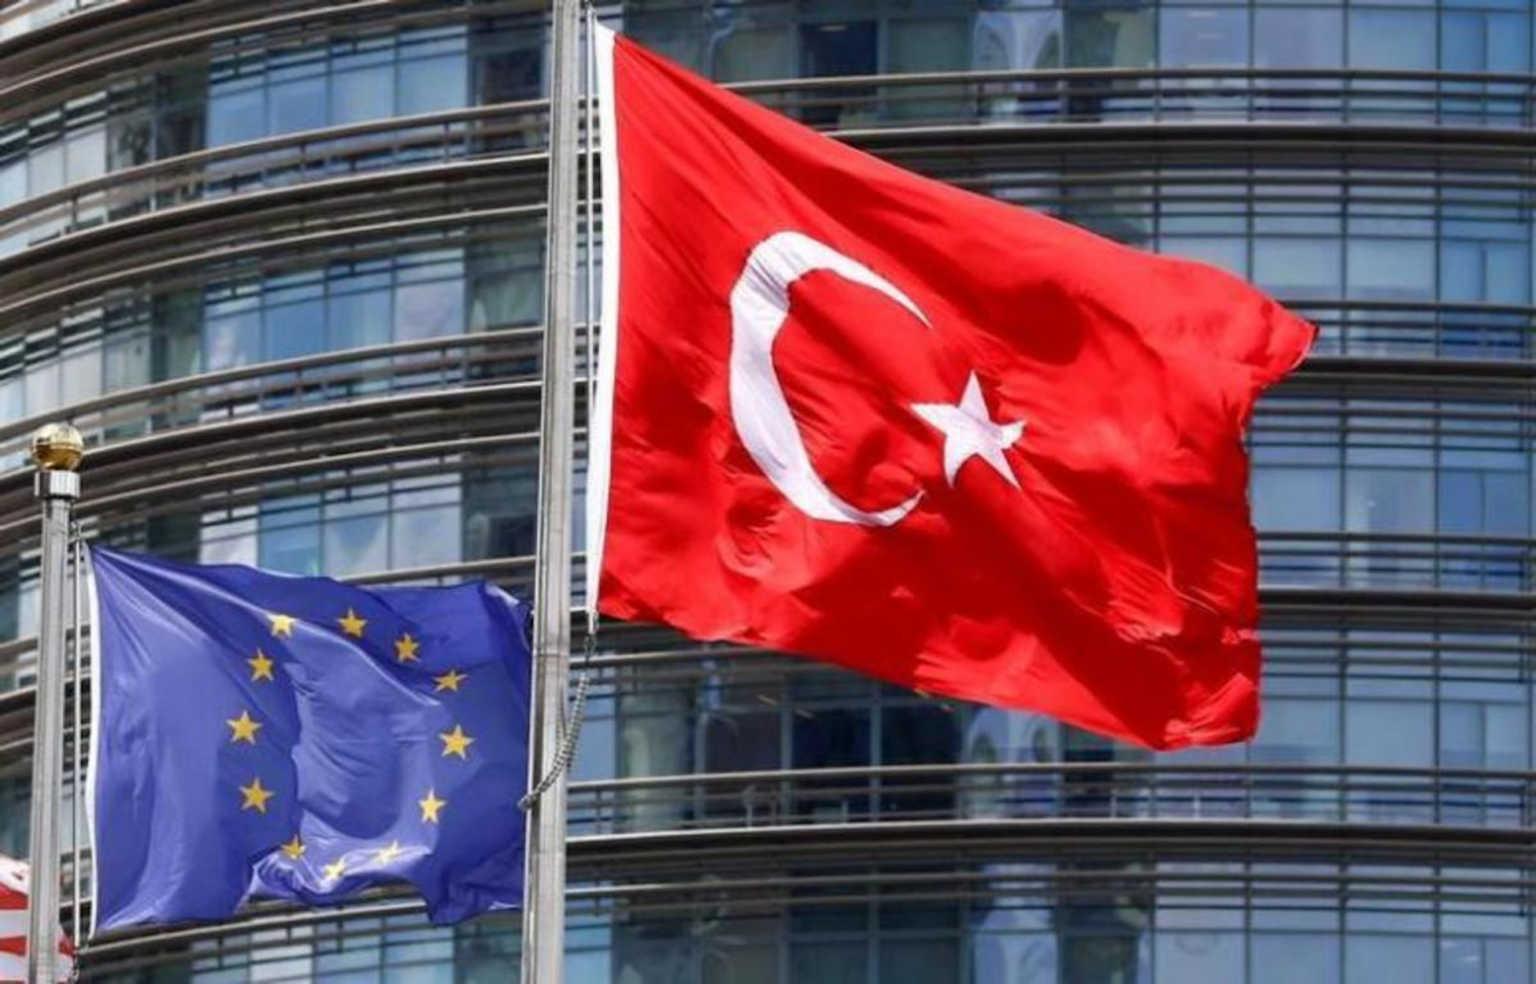 EUMED9 – Τουρκία: Οργισμένη αντίδραση για την διακήρυξη των ηγετών – «Να την εγκαταλείψουν»